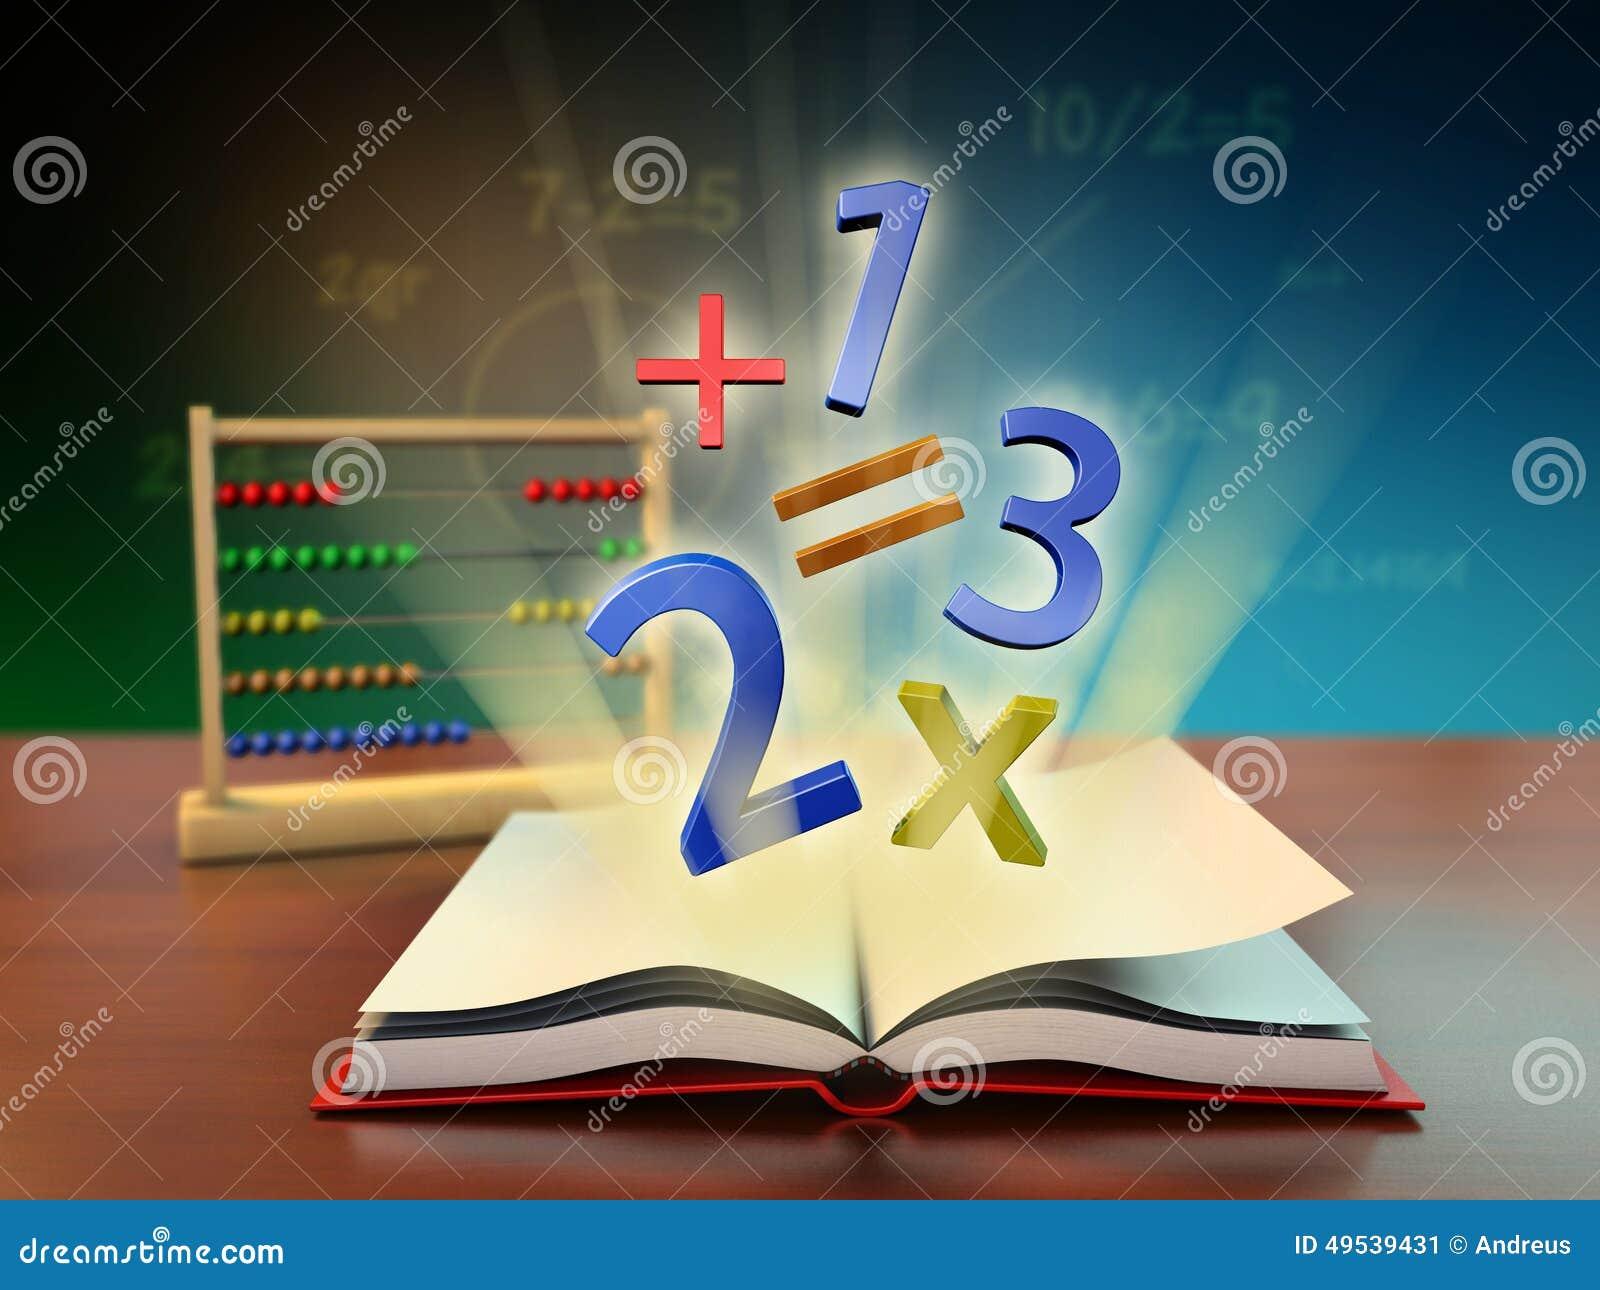 oa.operator algebras - Alternative for Kadison and ...